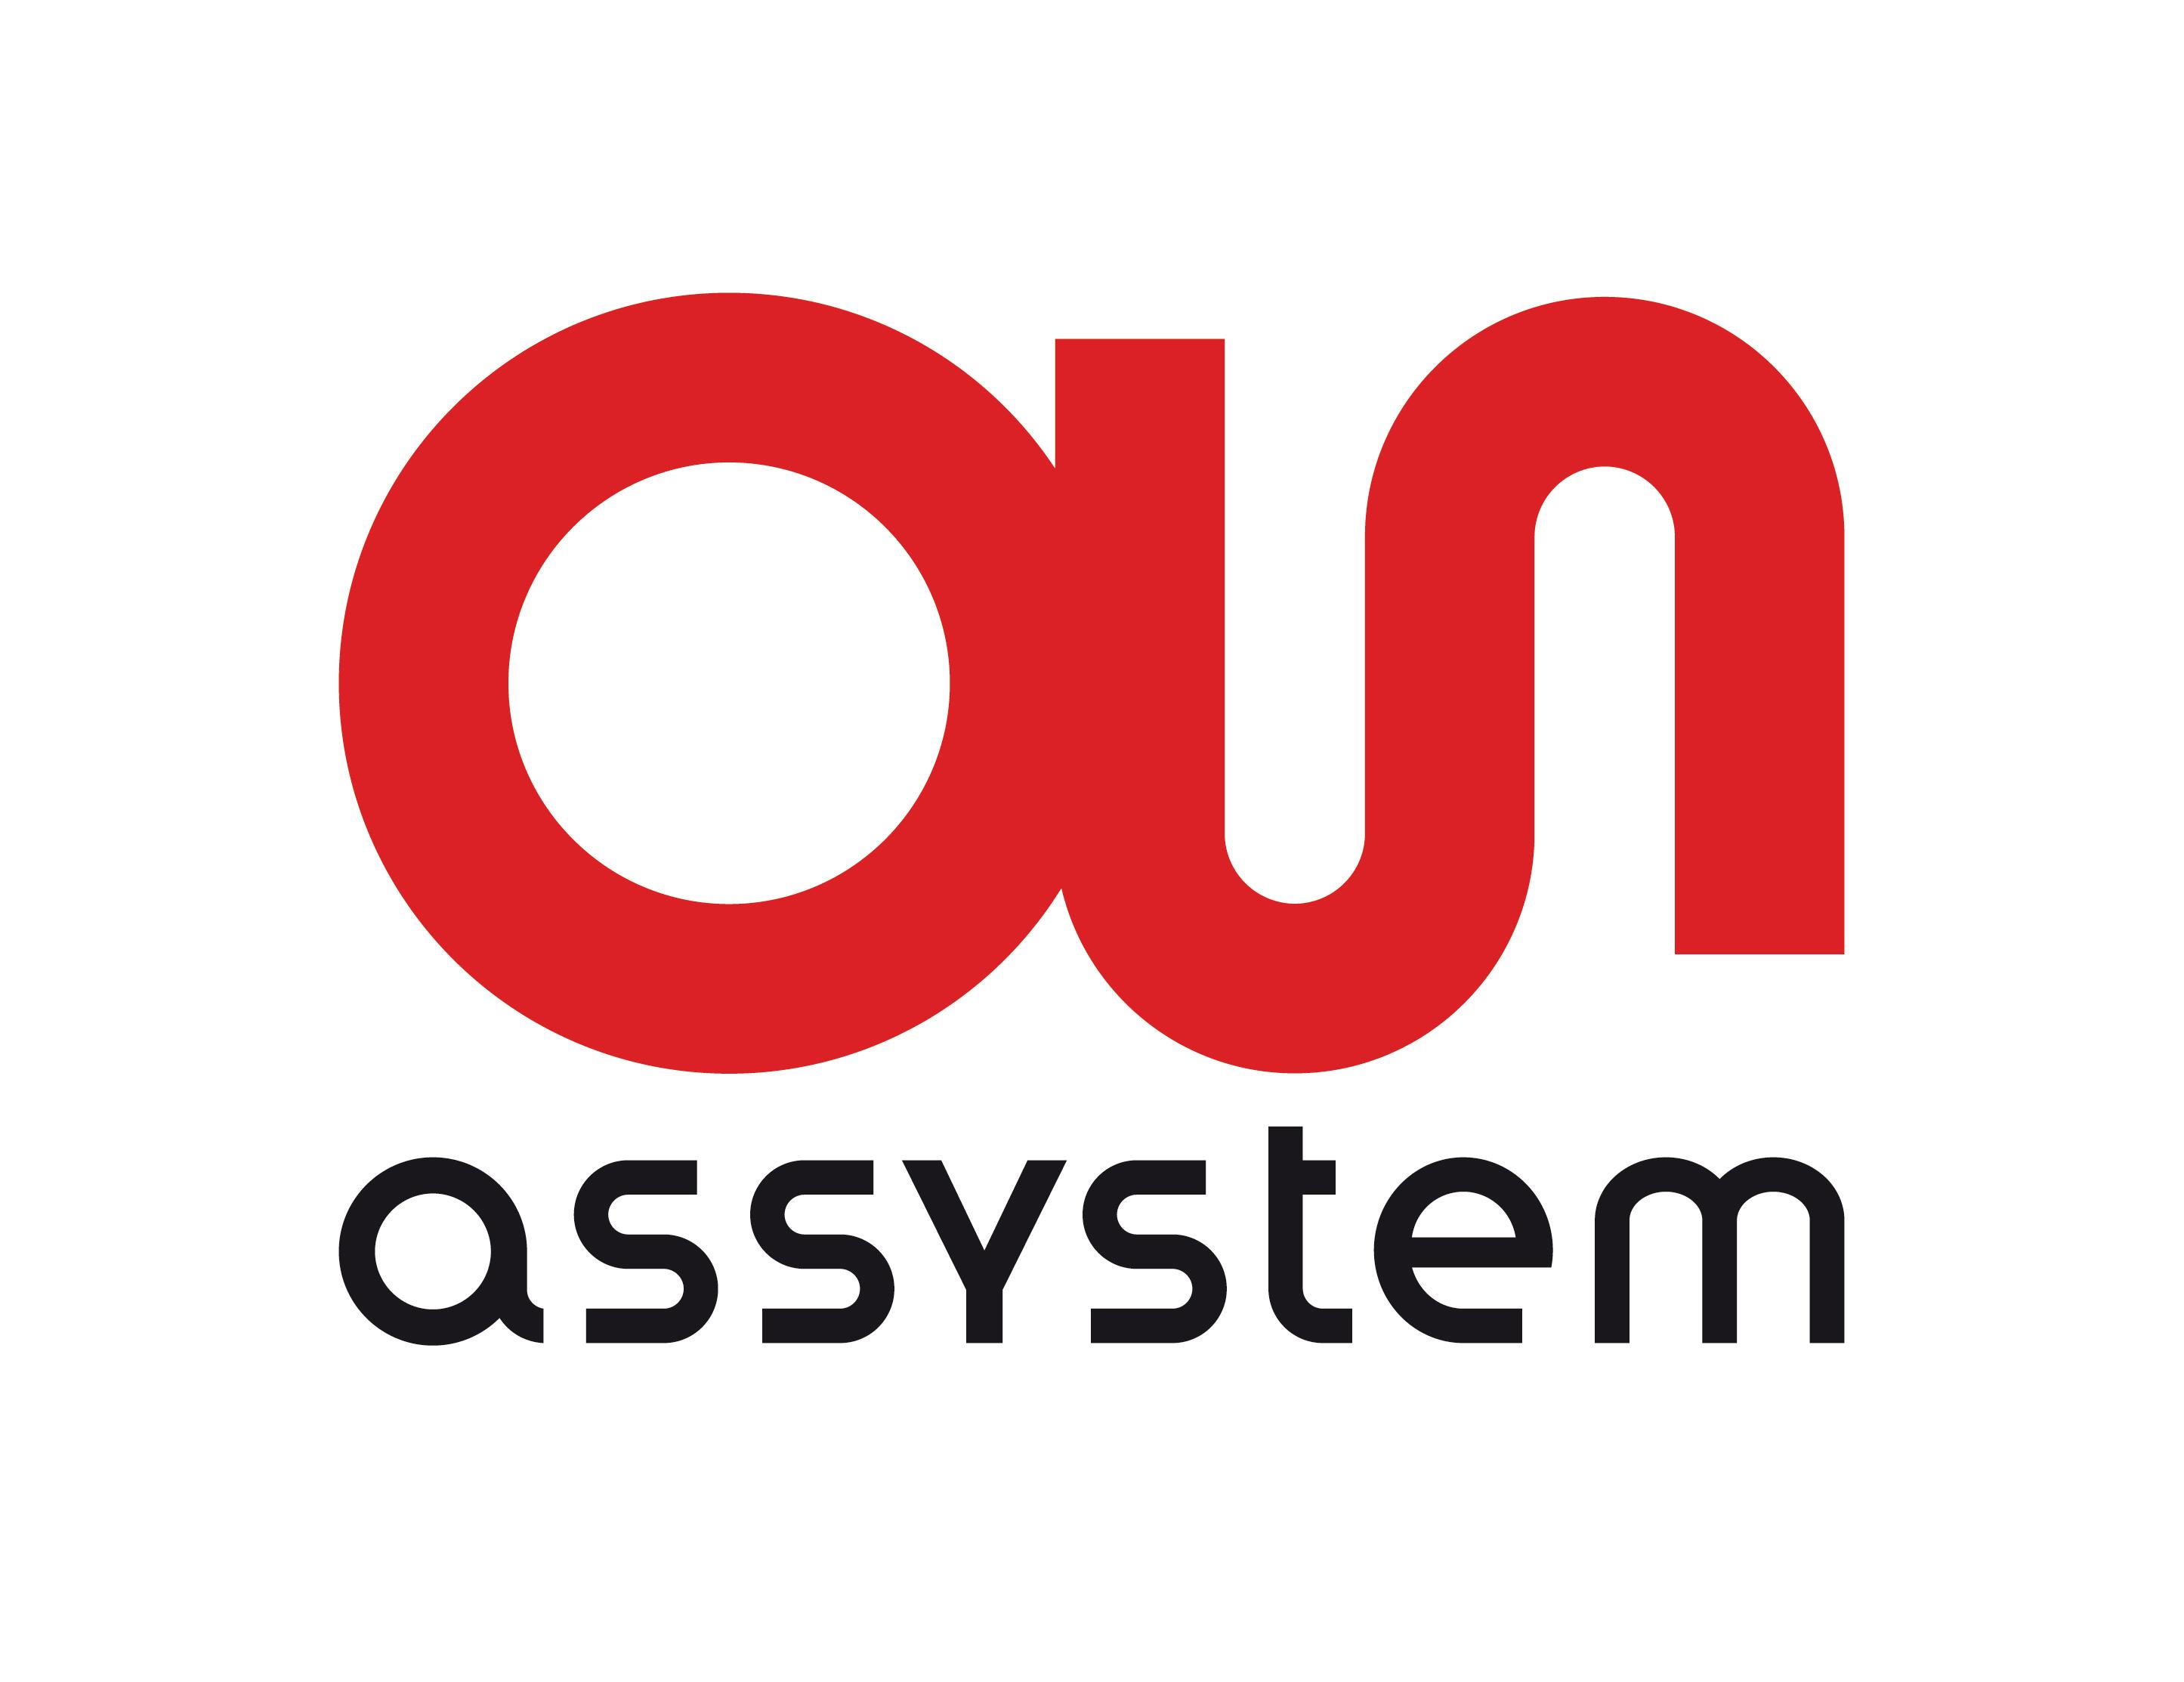 logo_ossystem